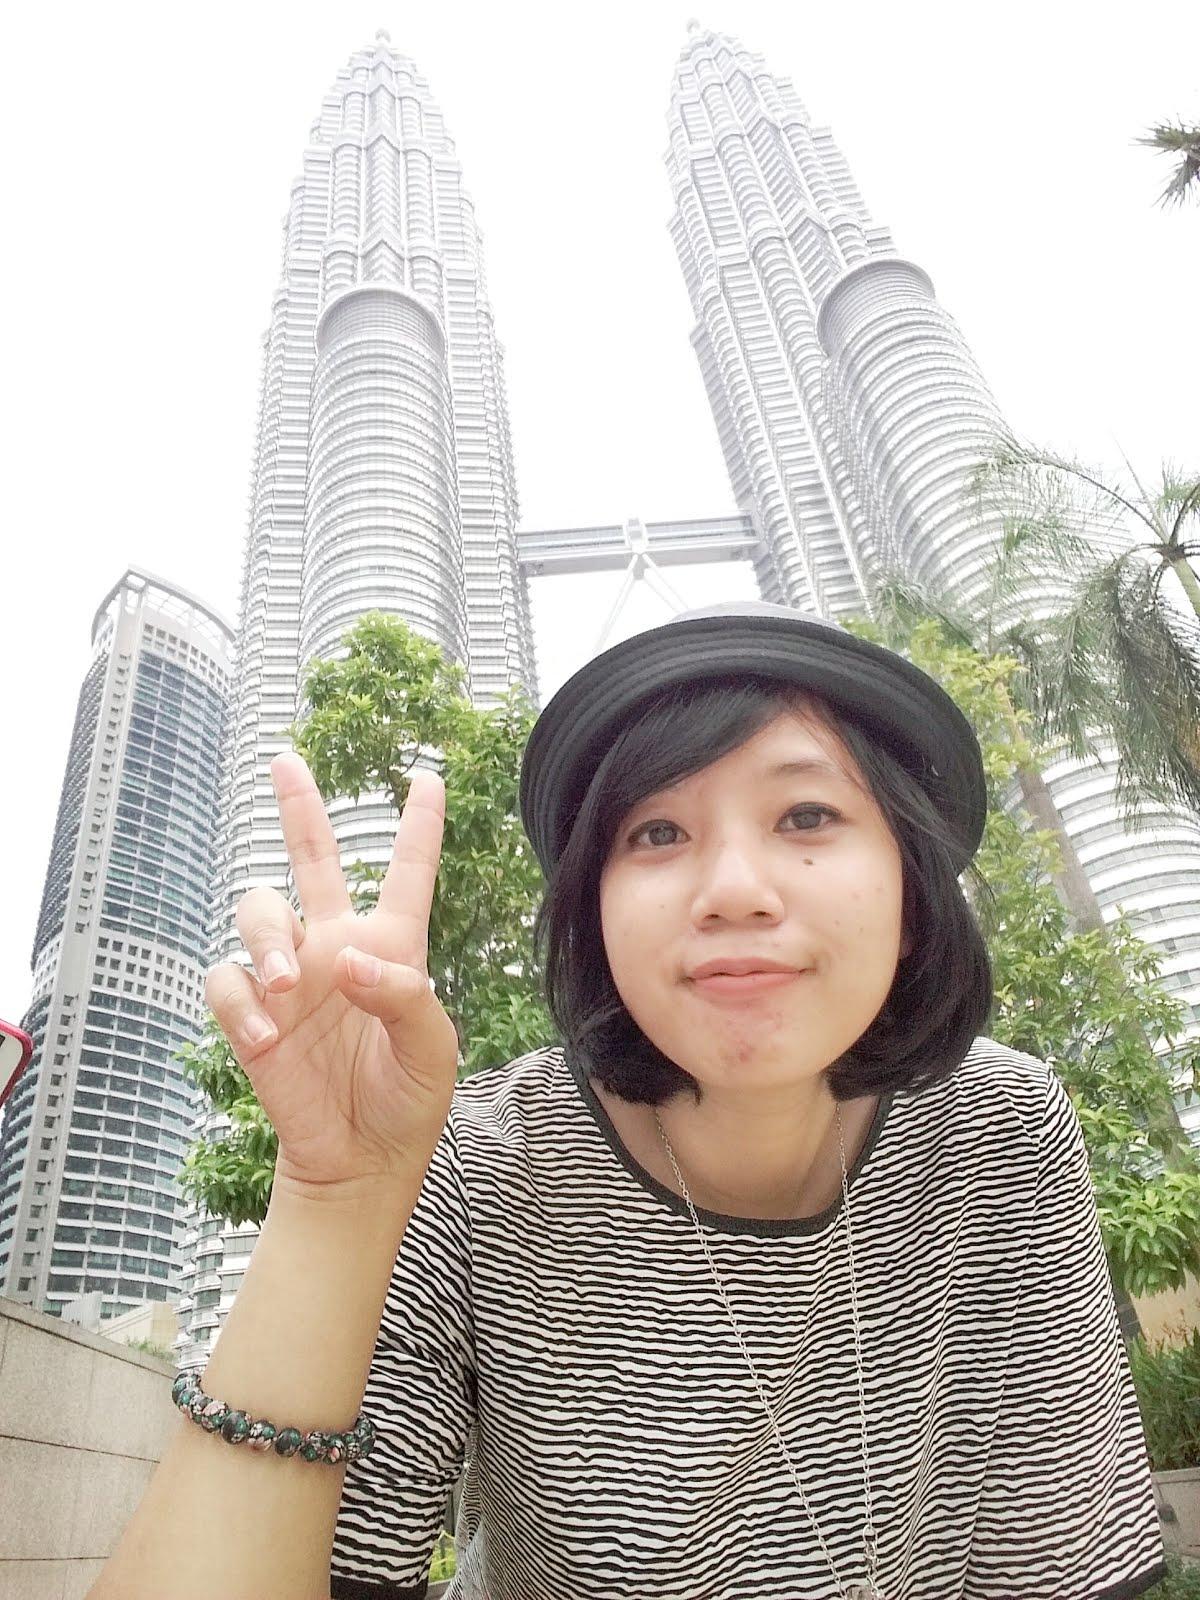 Travel to Kuala Lumpur, 2015